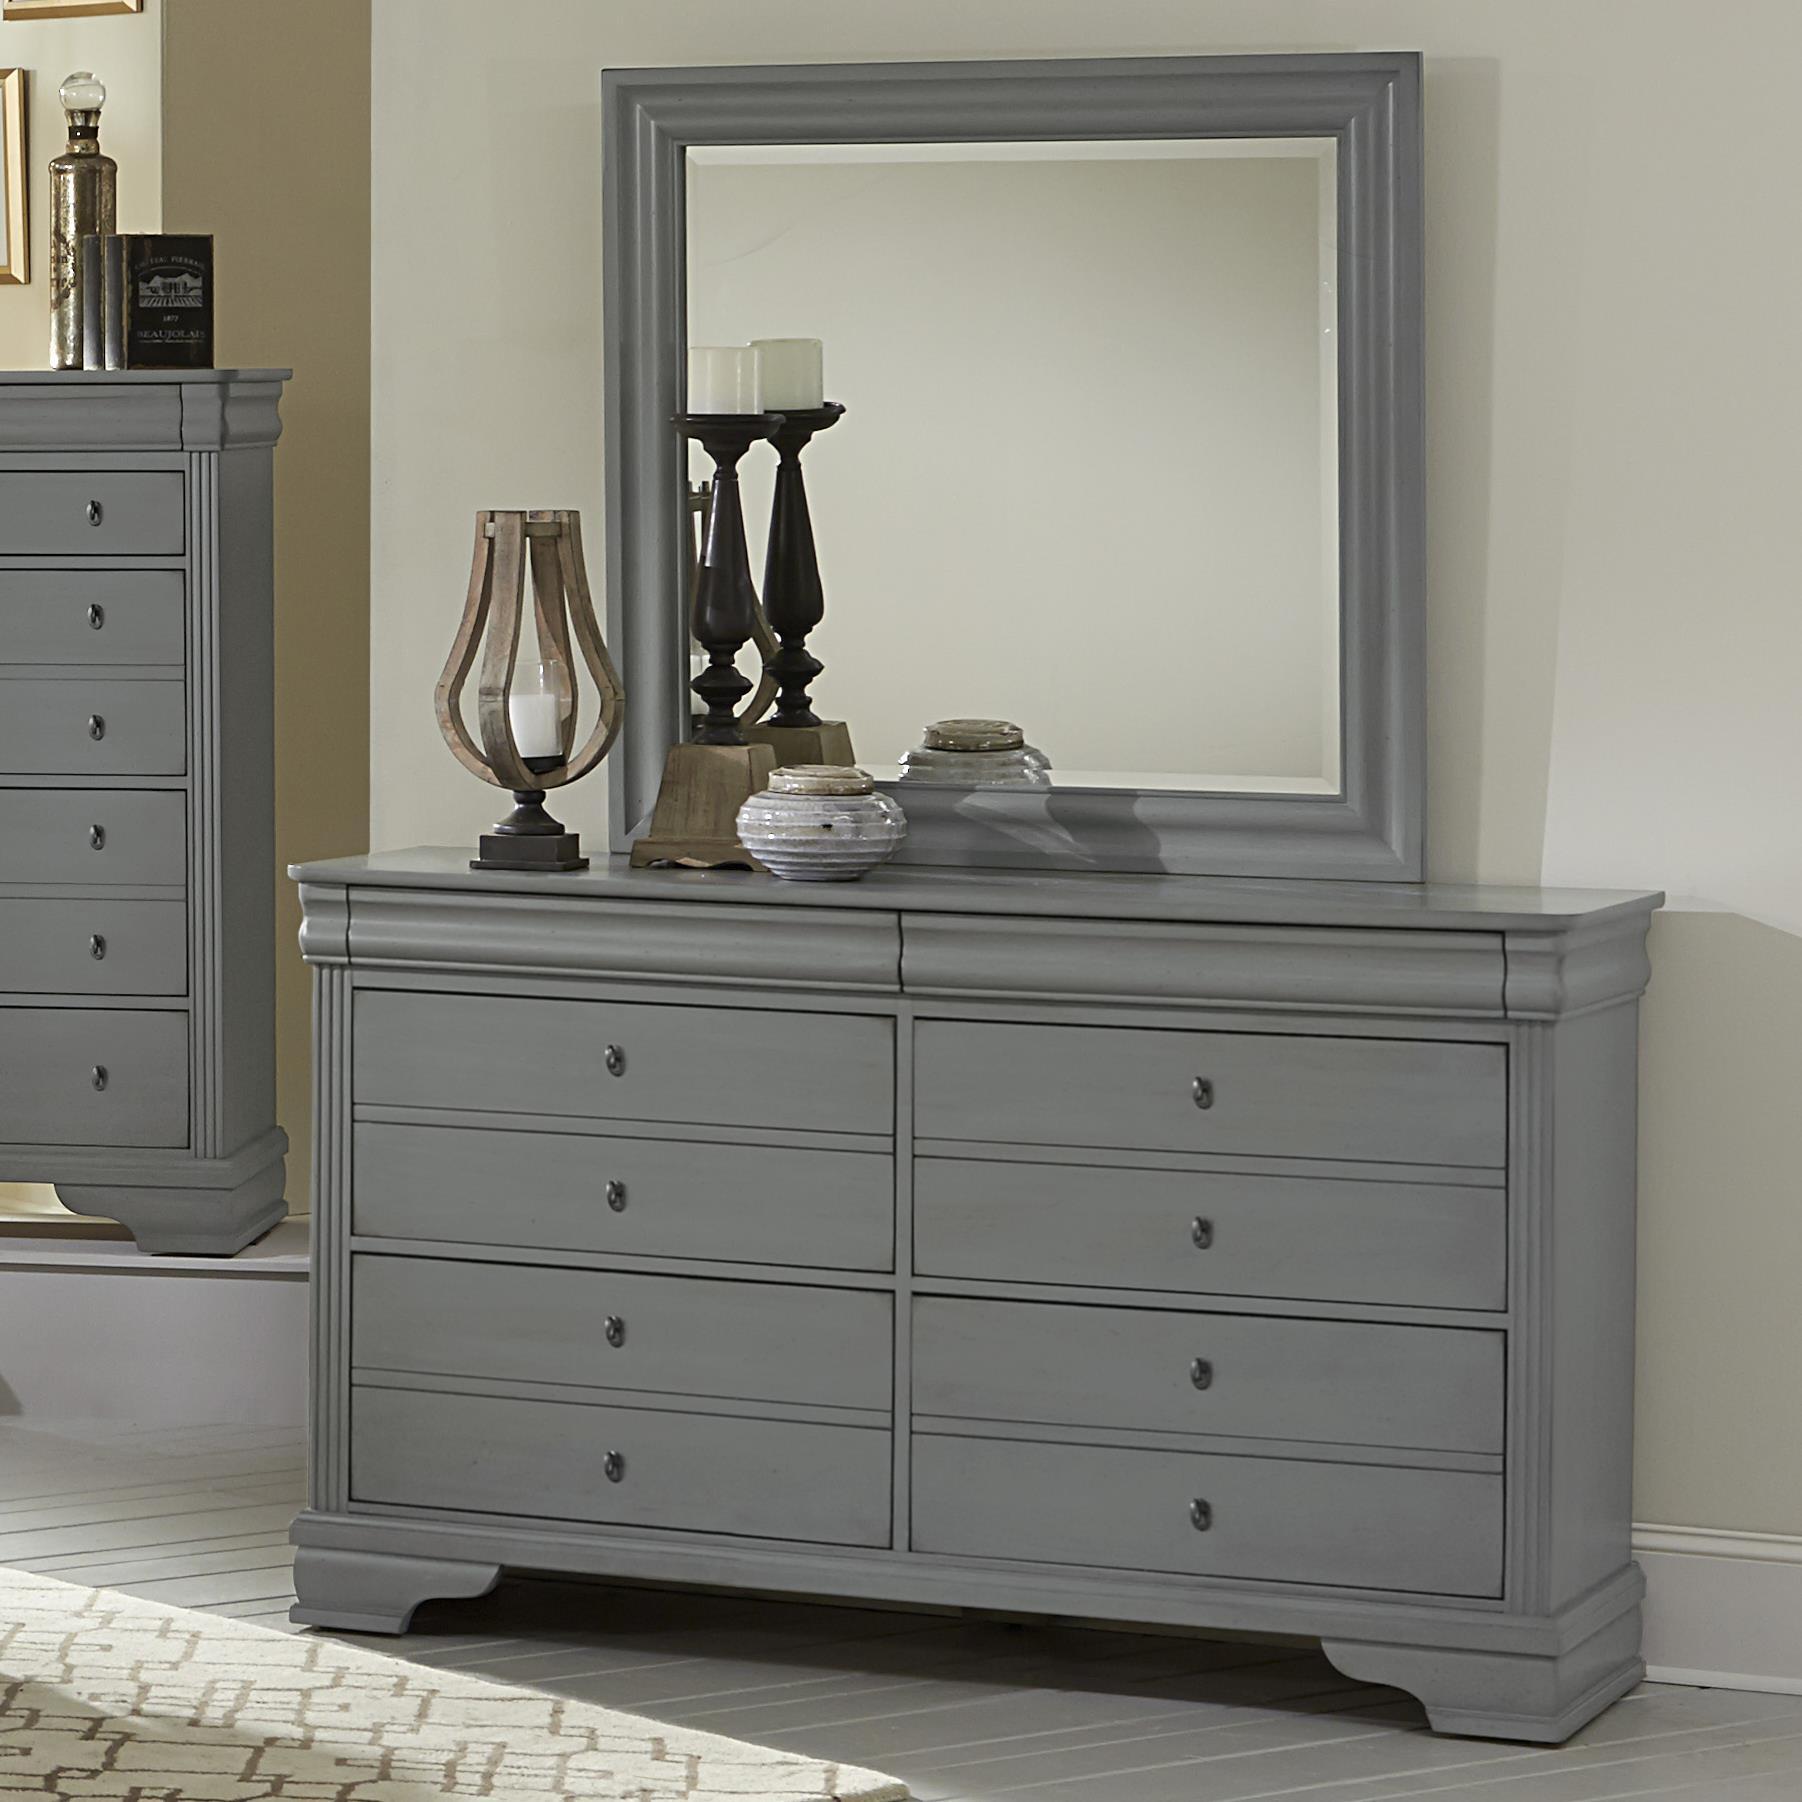 Vaughan Bassett French Market Dresser & Landscape Mirror - Item Number: 381-002+446